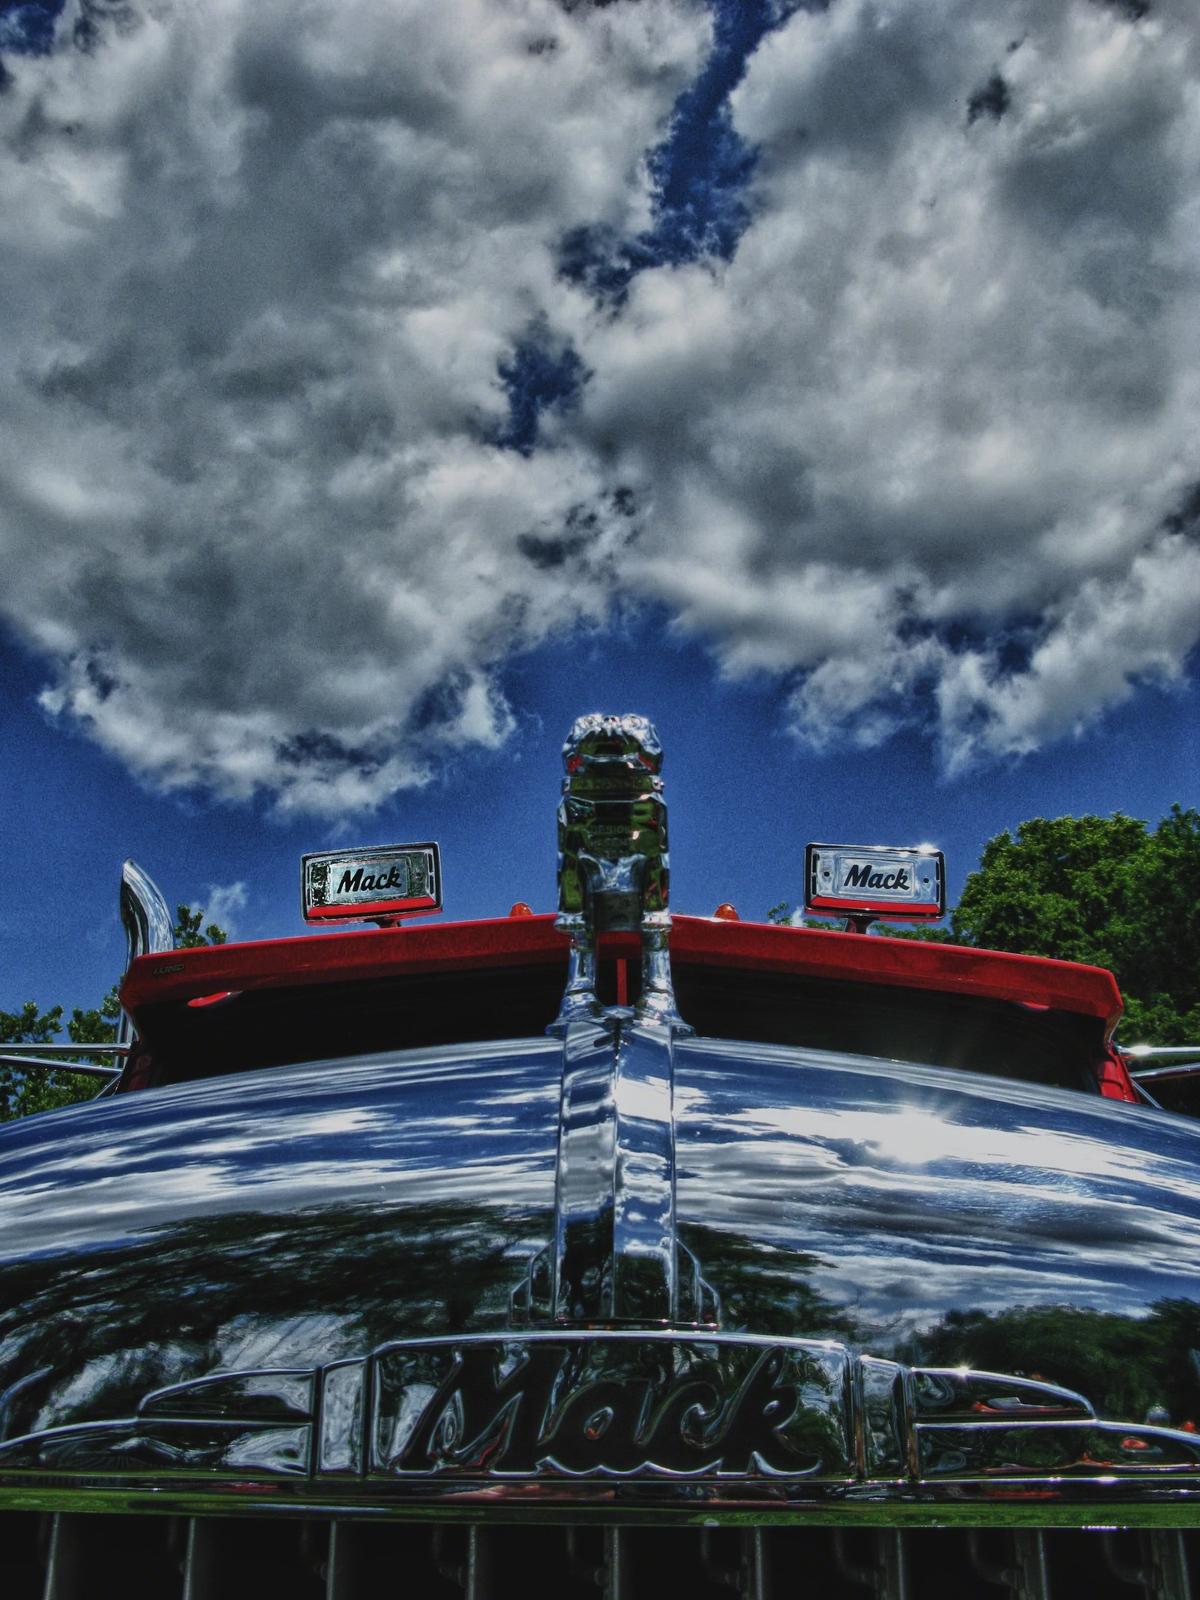 pennsylvania, macungie, mack, atca antique truckshow, bulldog, image, macungie memorial park, truck, chrome, refection, vintage...